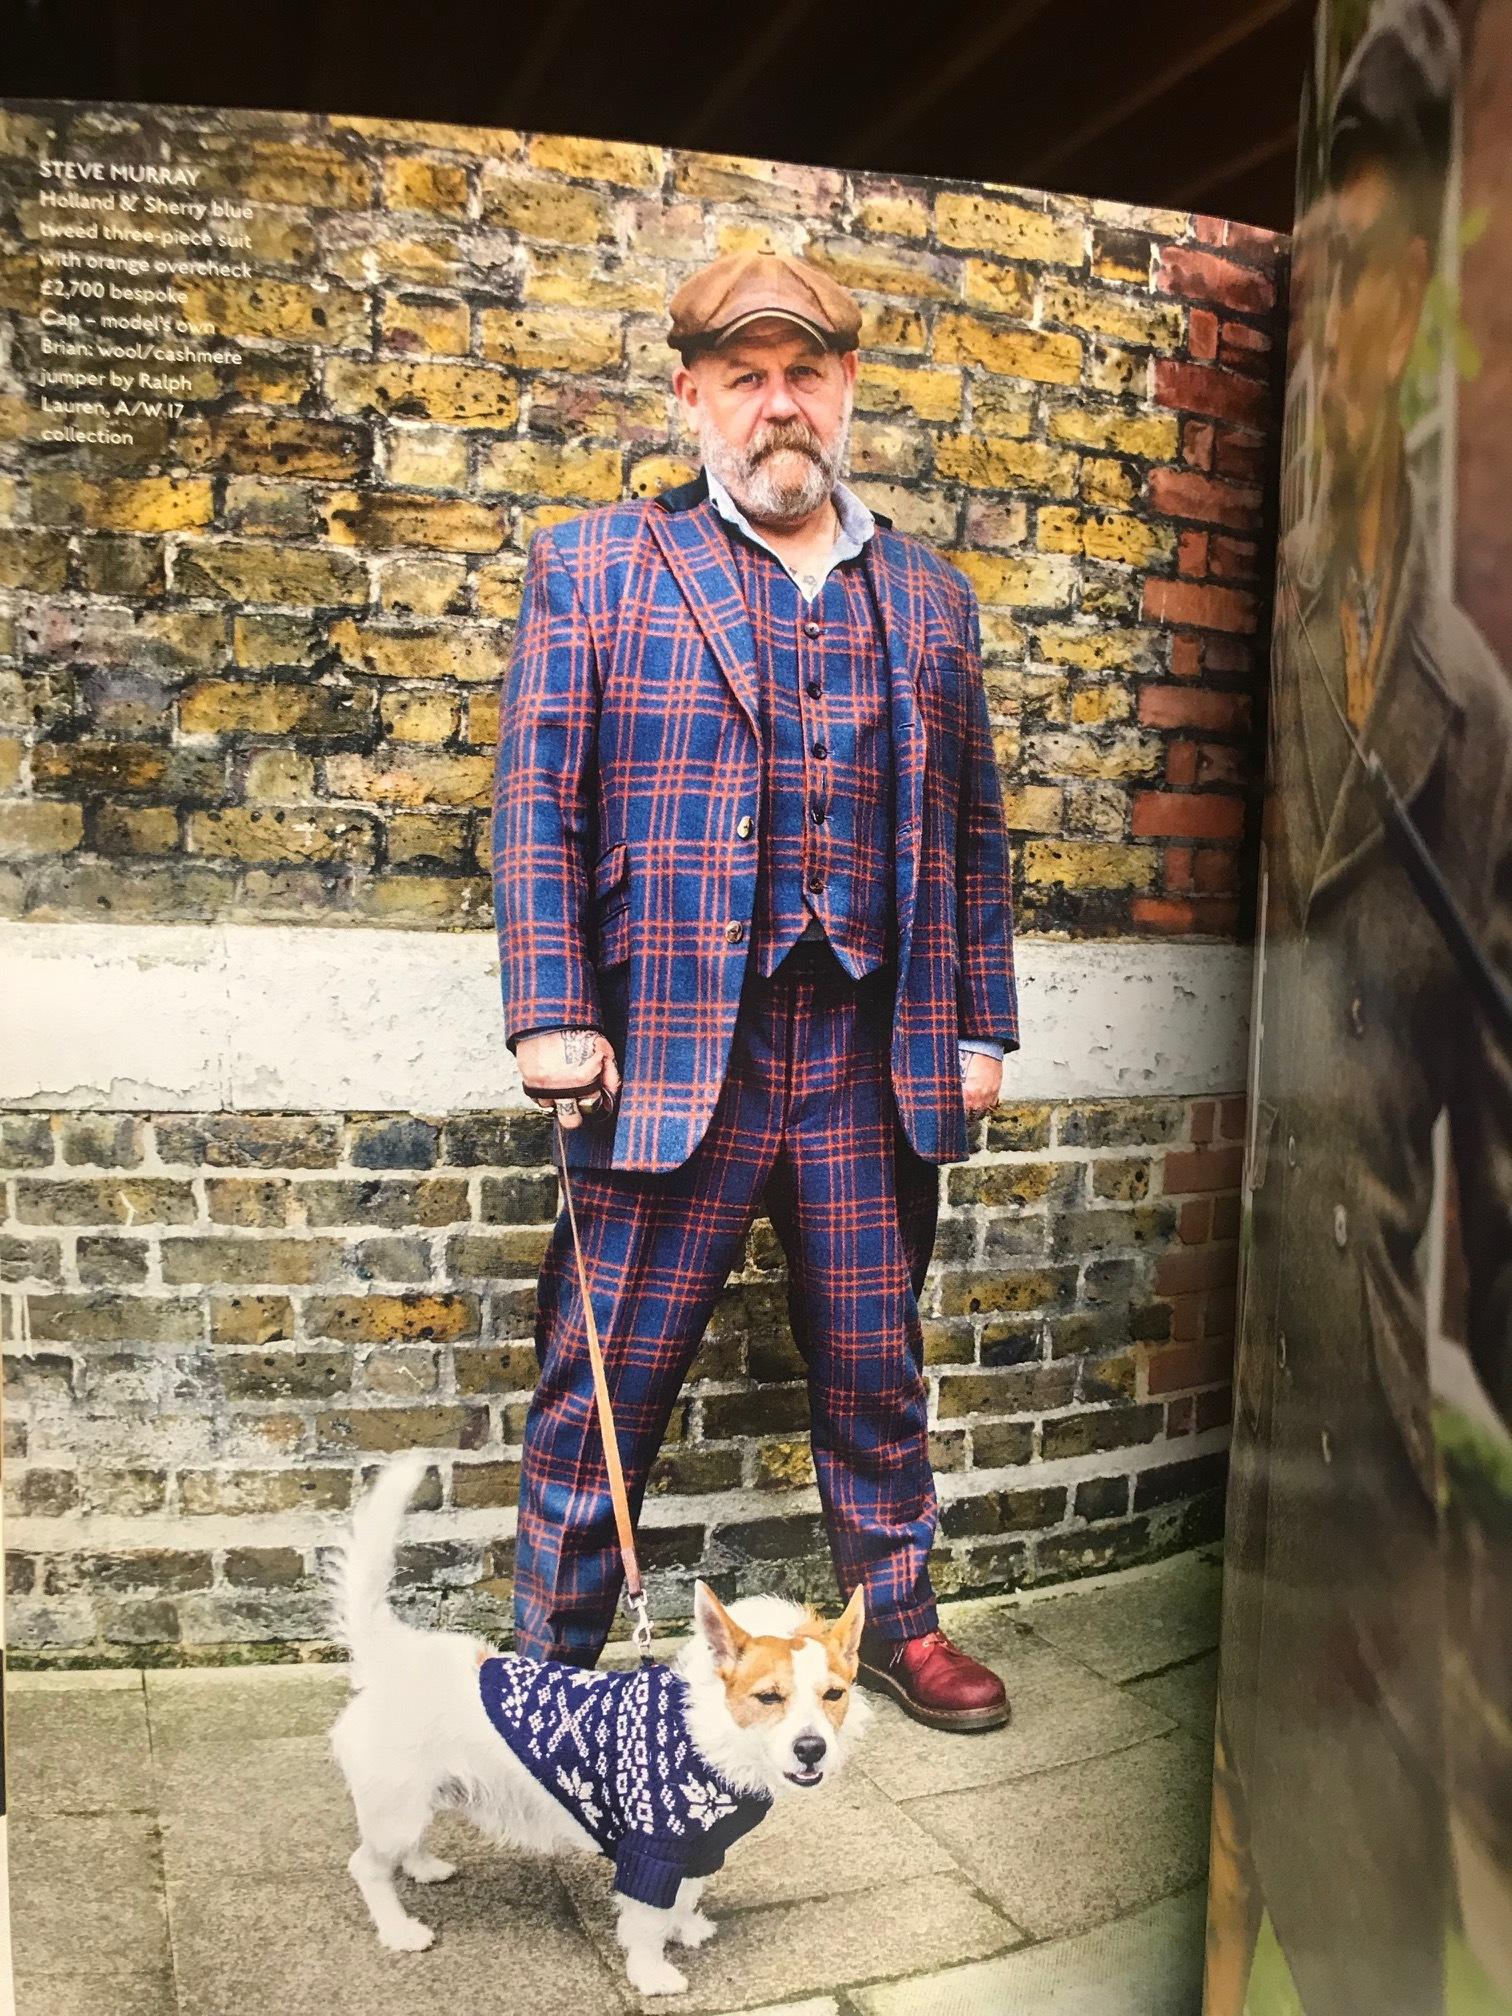 Steve Beardy Man Murray and Brian for The Chap shoot Nov 2017.jpg